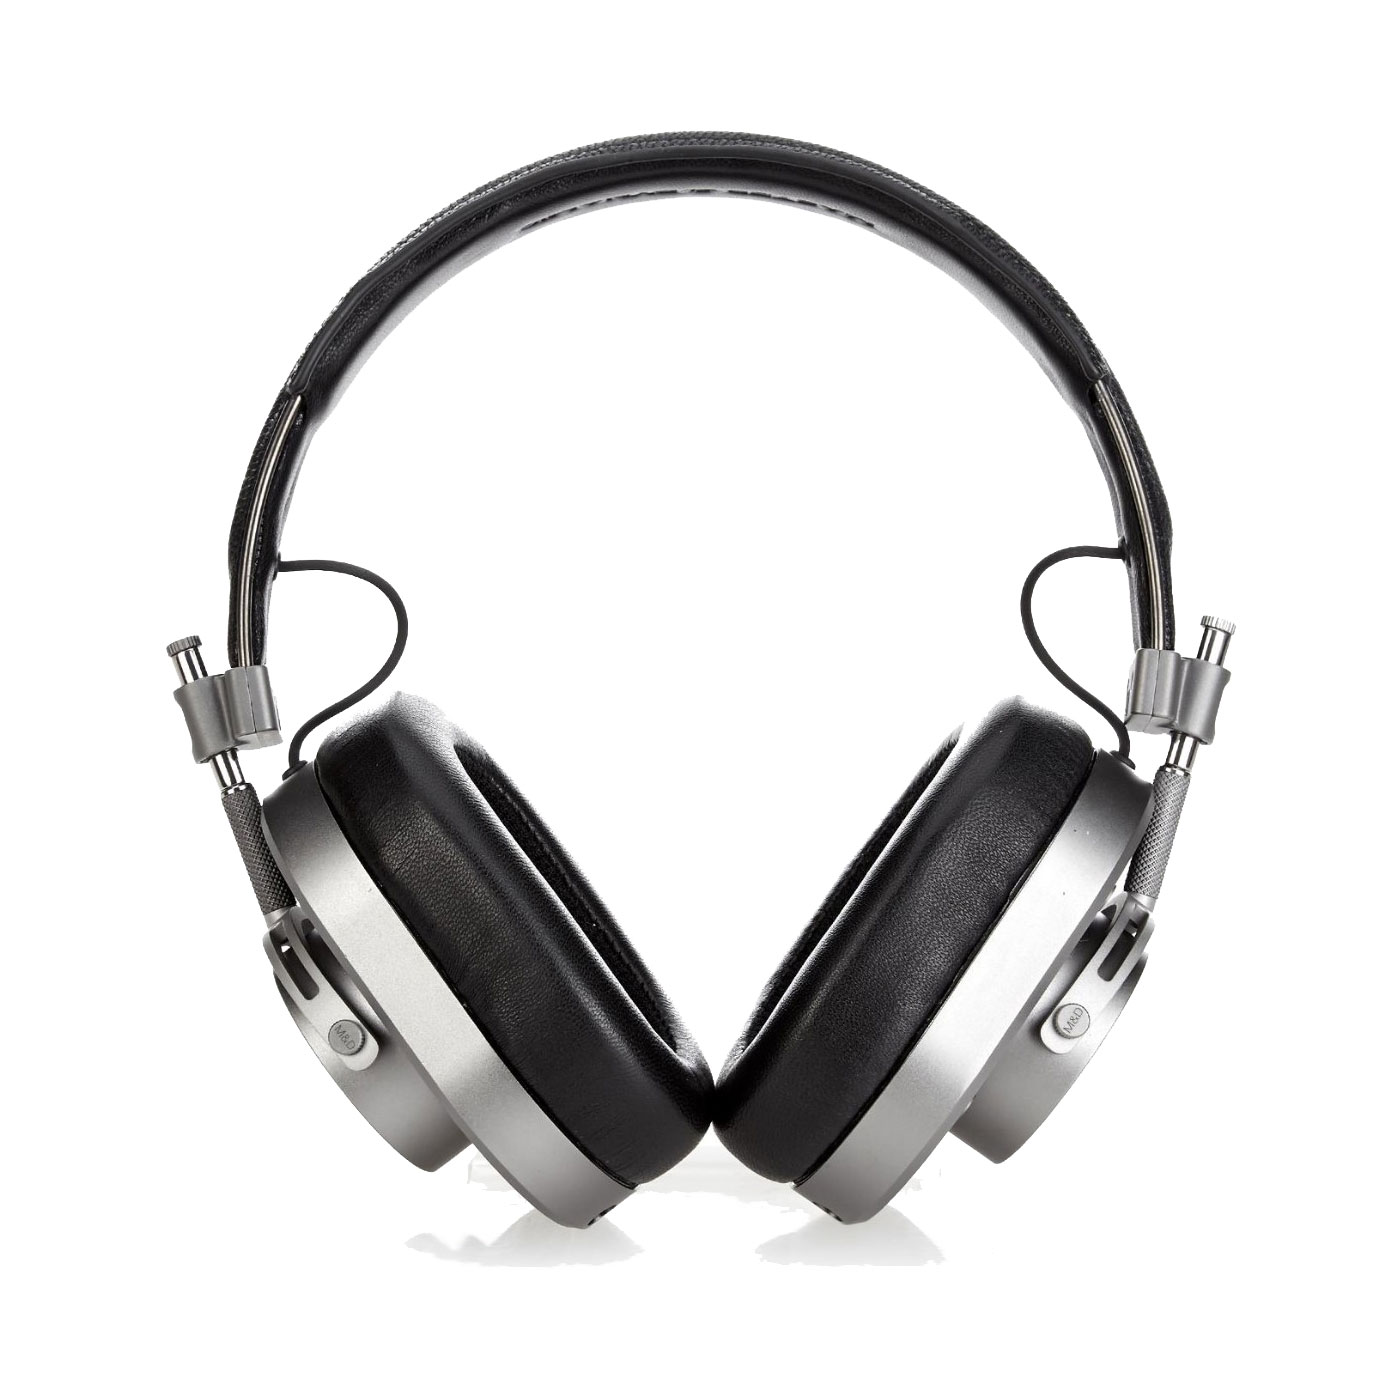 MASTER-&-DYNAMIC-Headphones.jpg